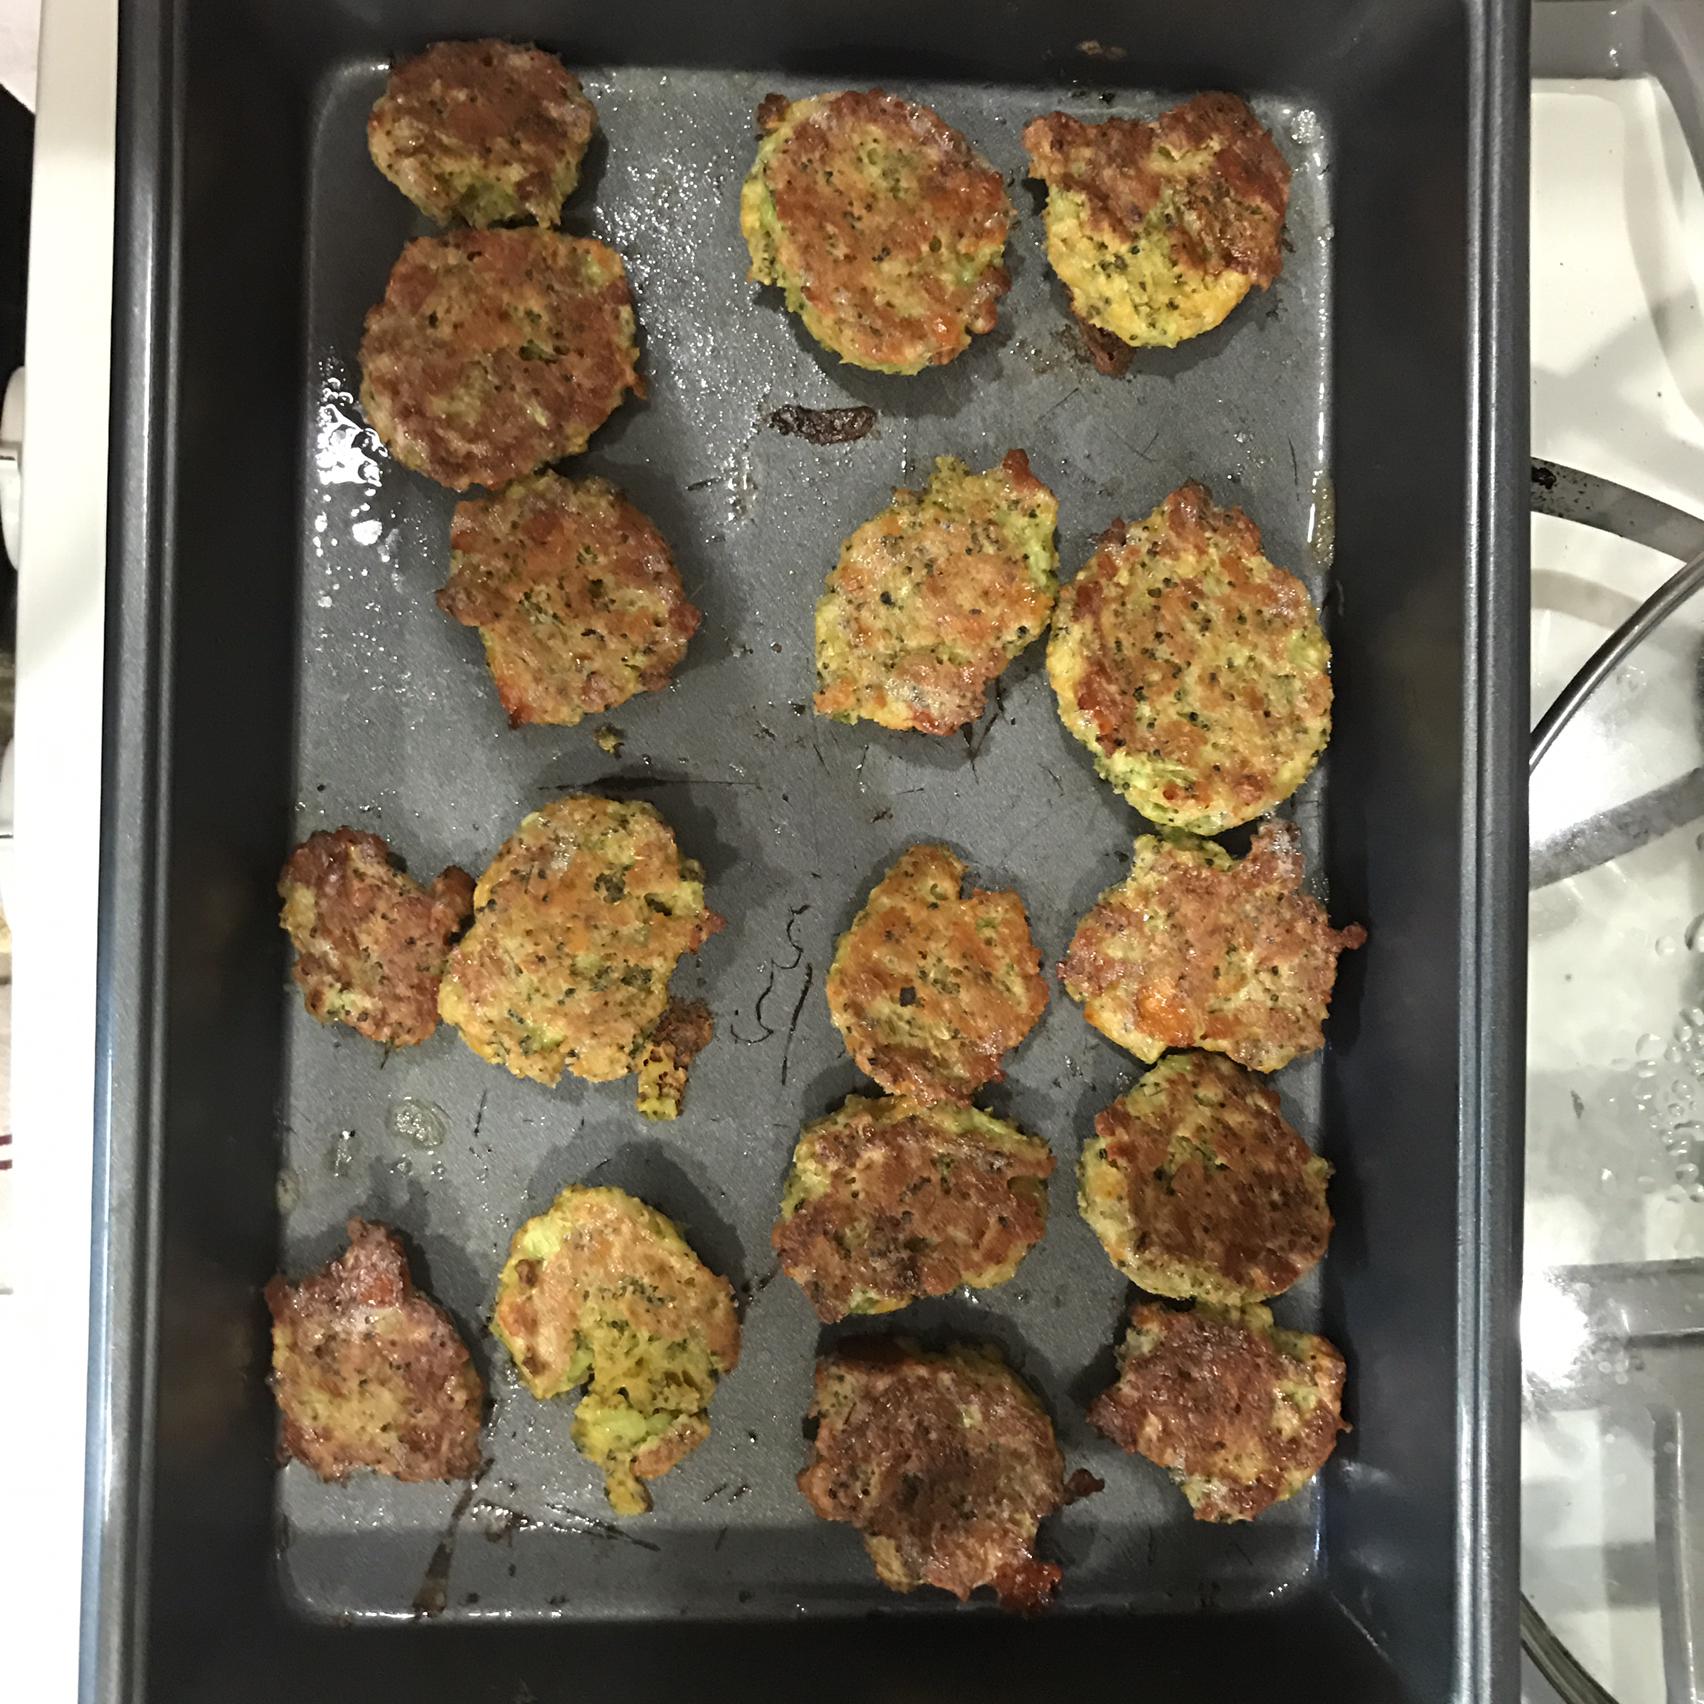 Broccoli and Cheddar Nuggets claugben